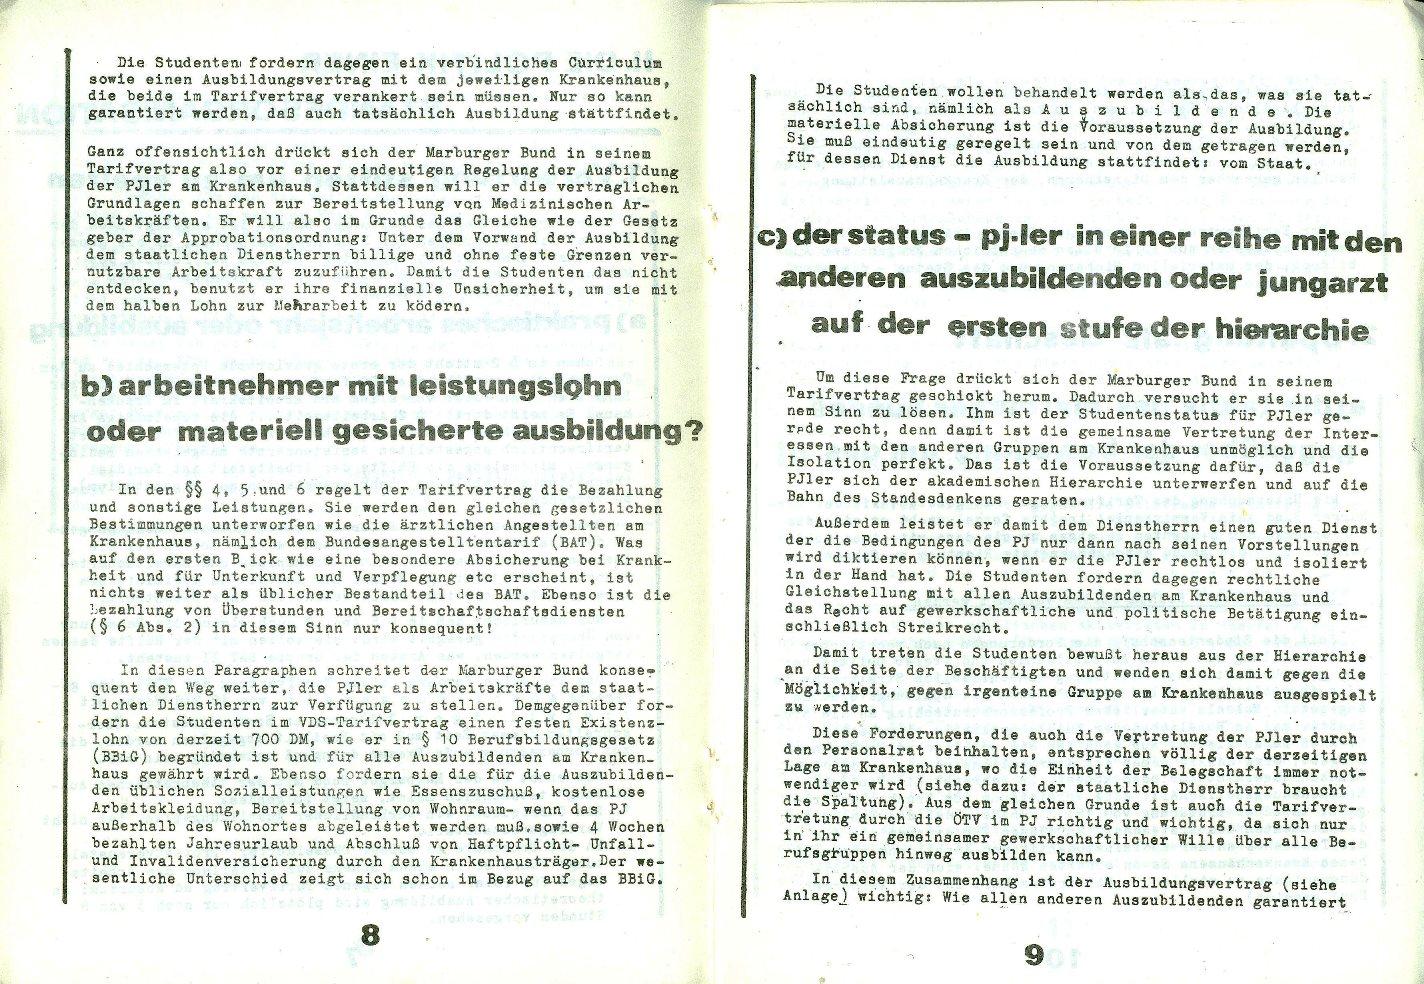 Kiel_Marburger_Bund005